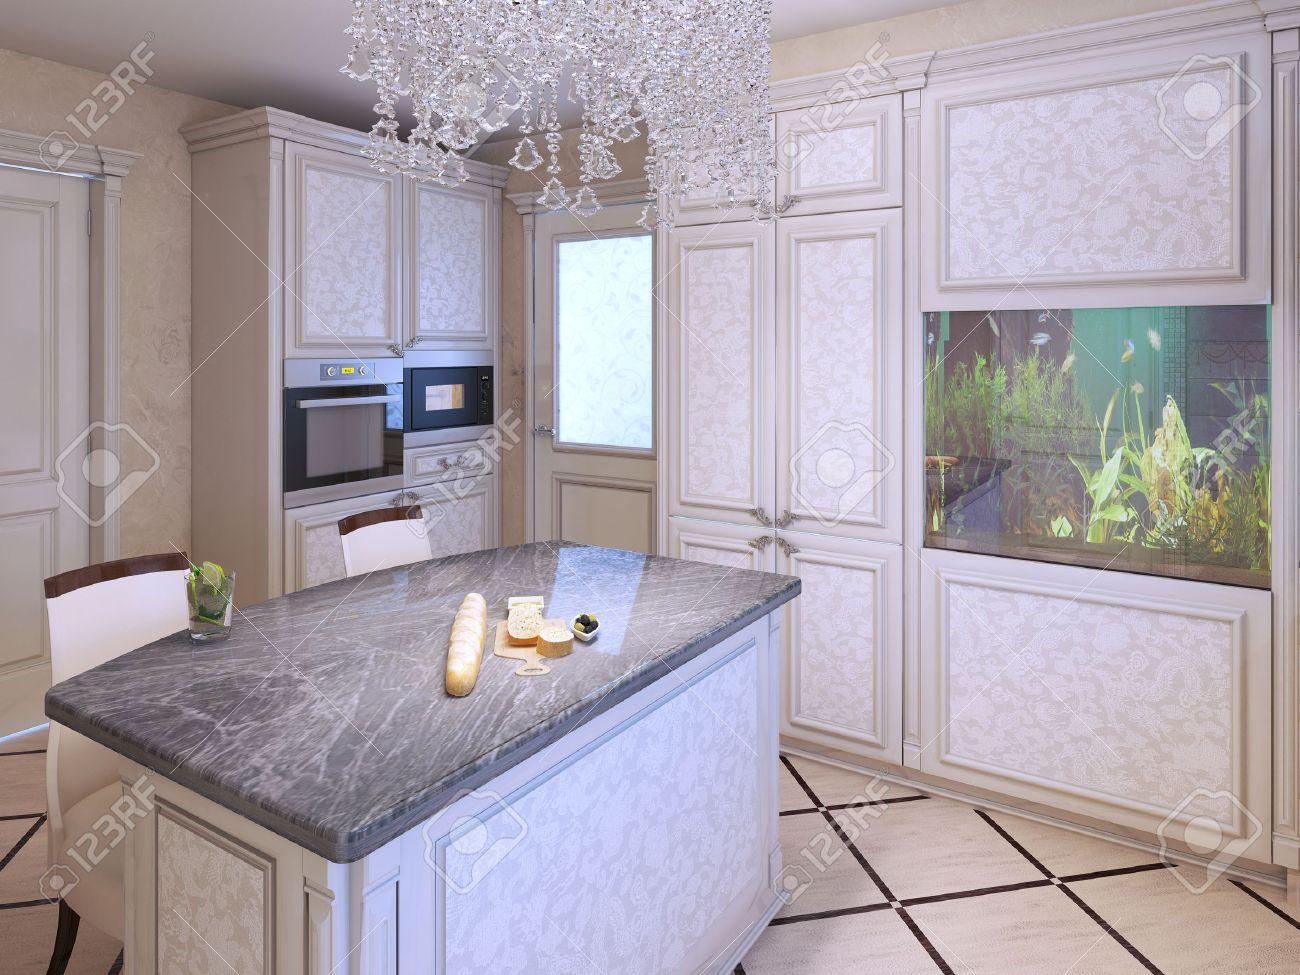 Helle Teure Kuchengestaltung Kuche Insel Bar Mit Granit